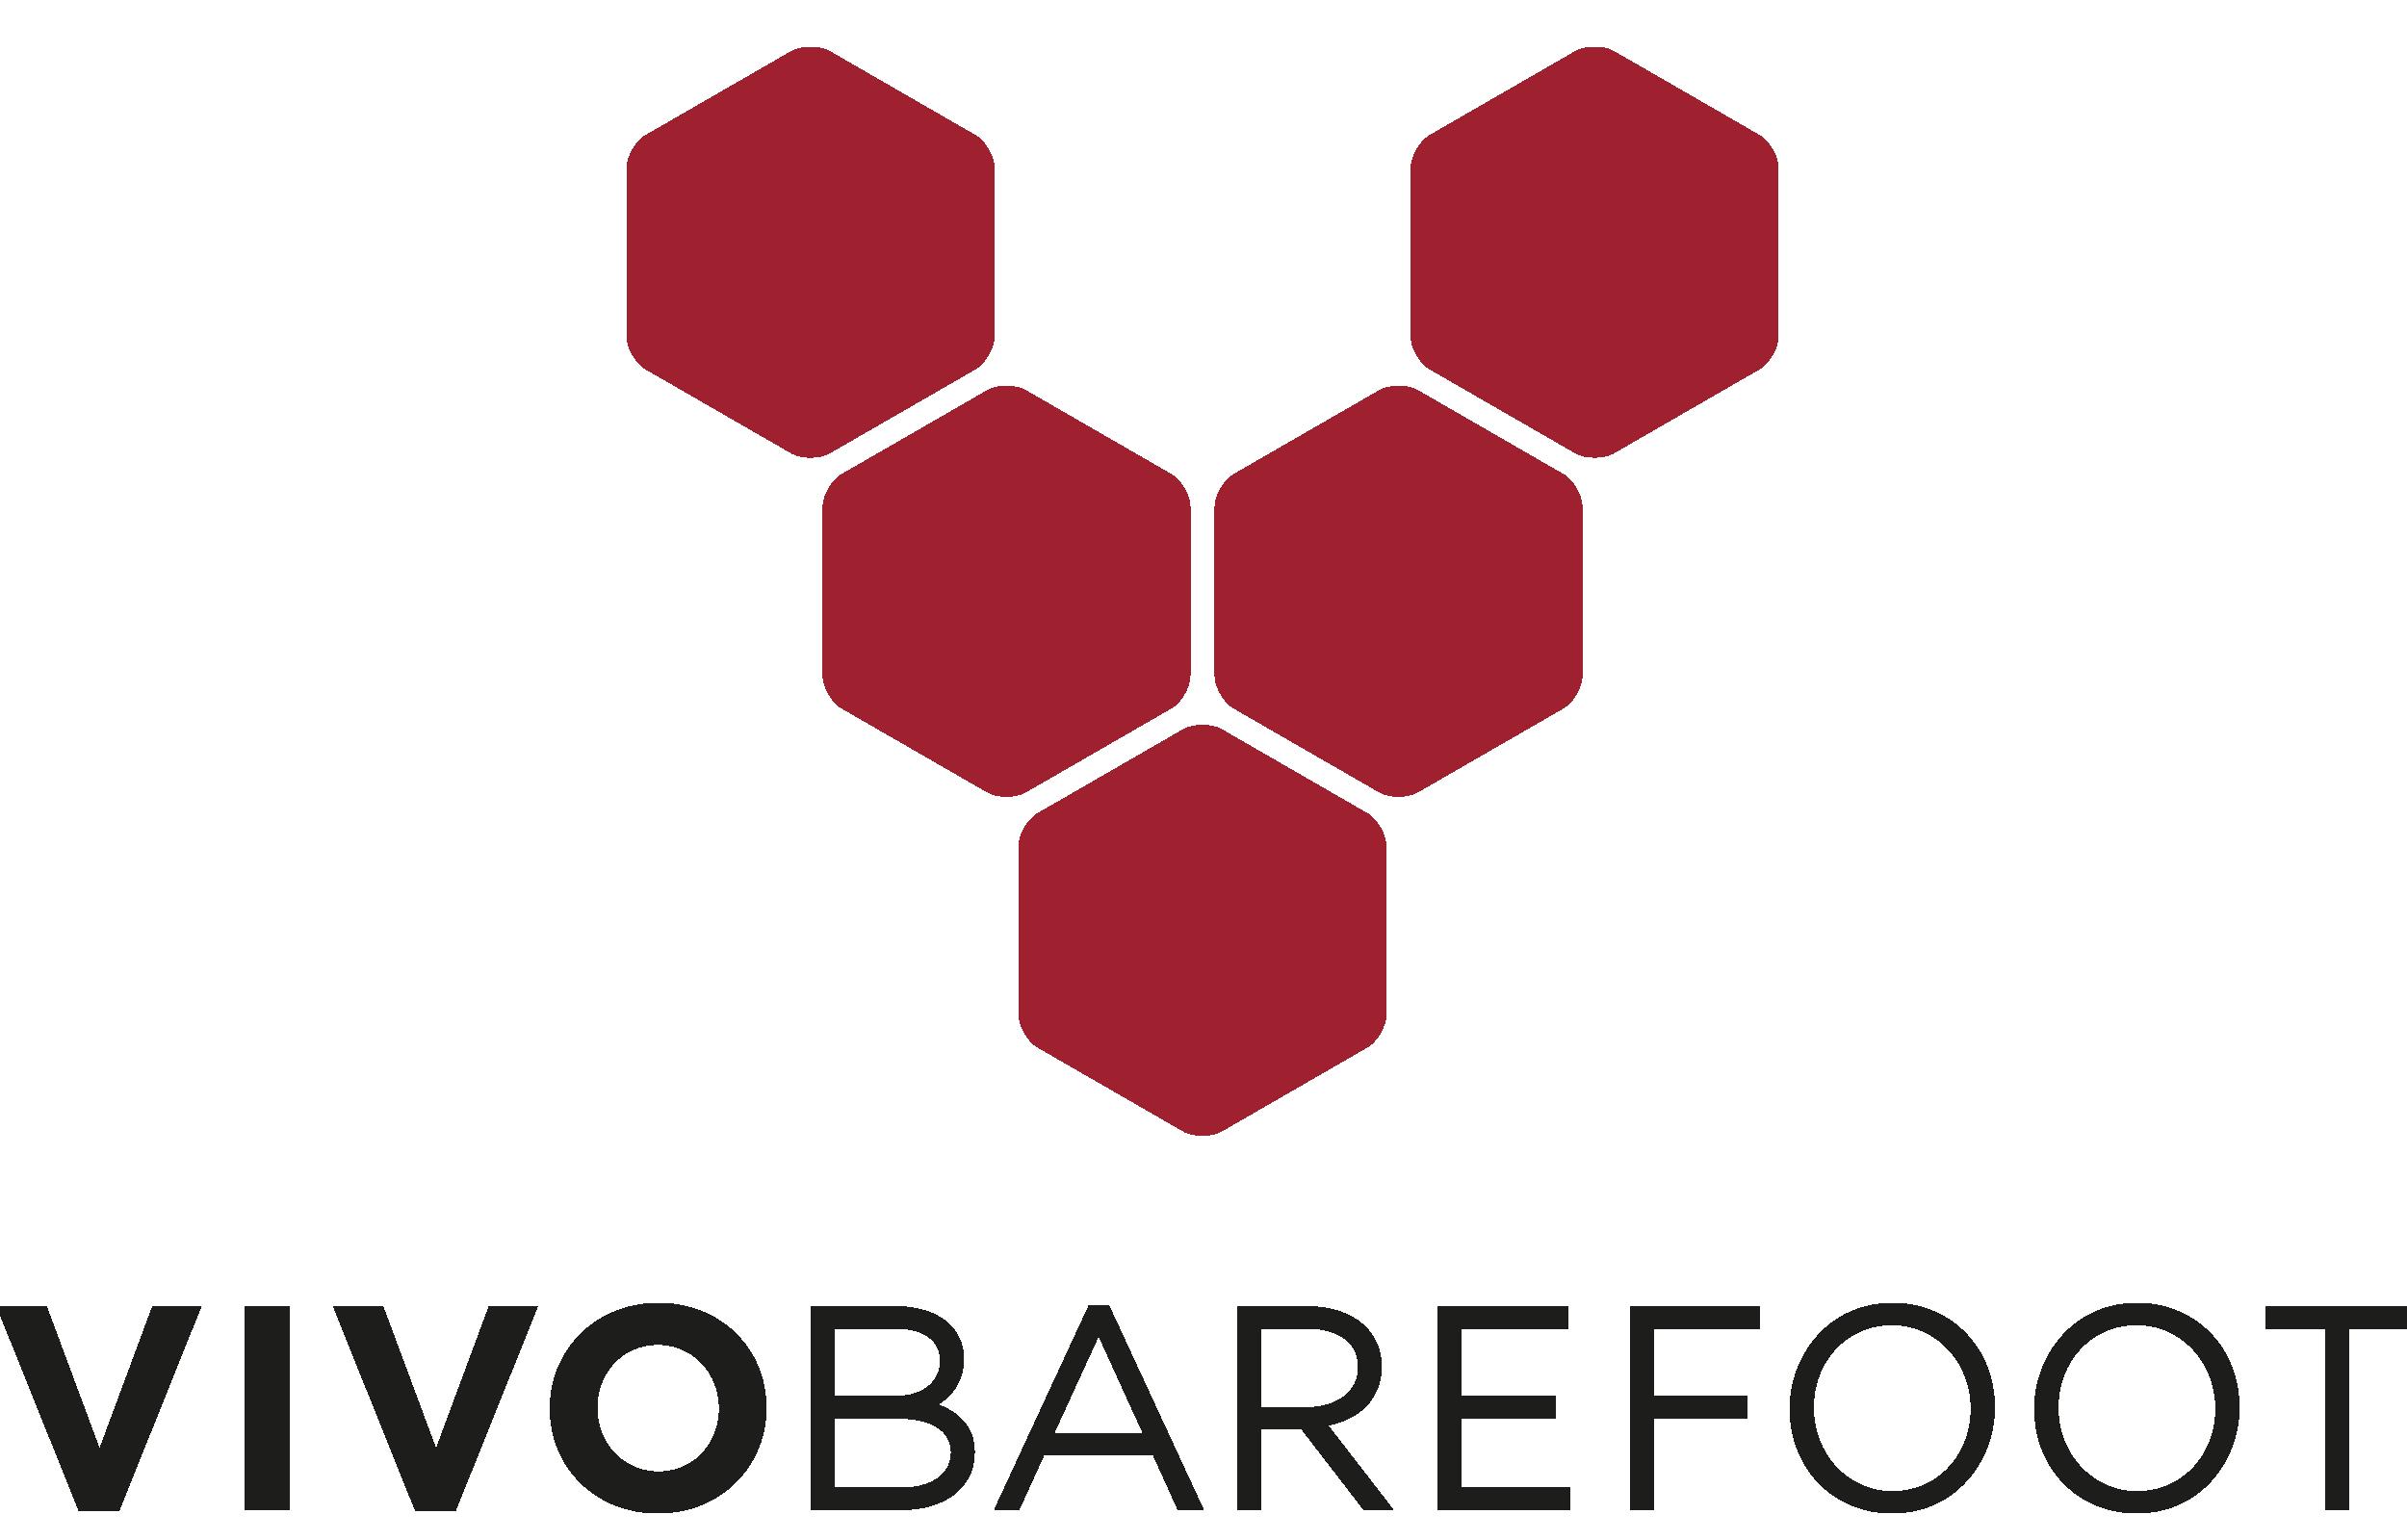 VivoBarefoot transparent logo